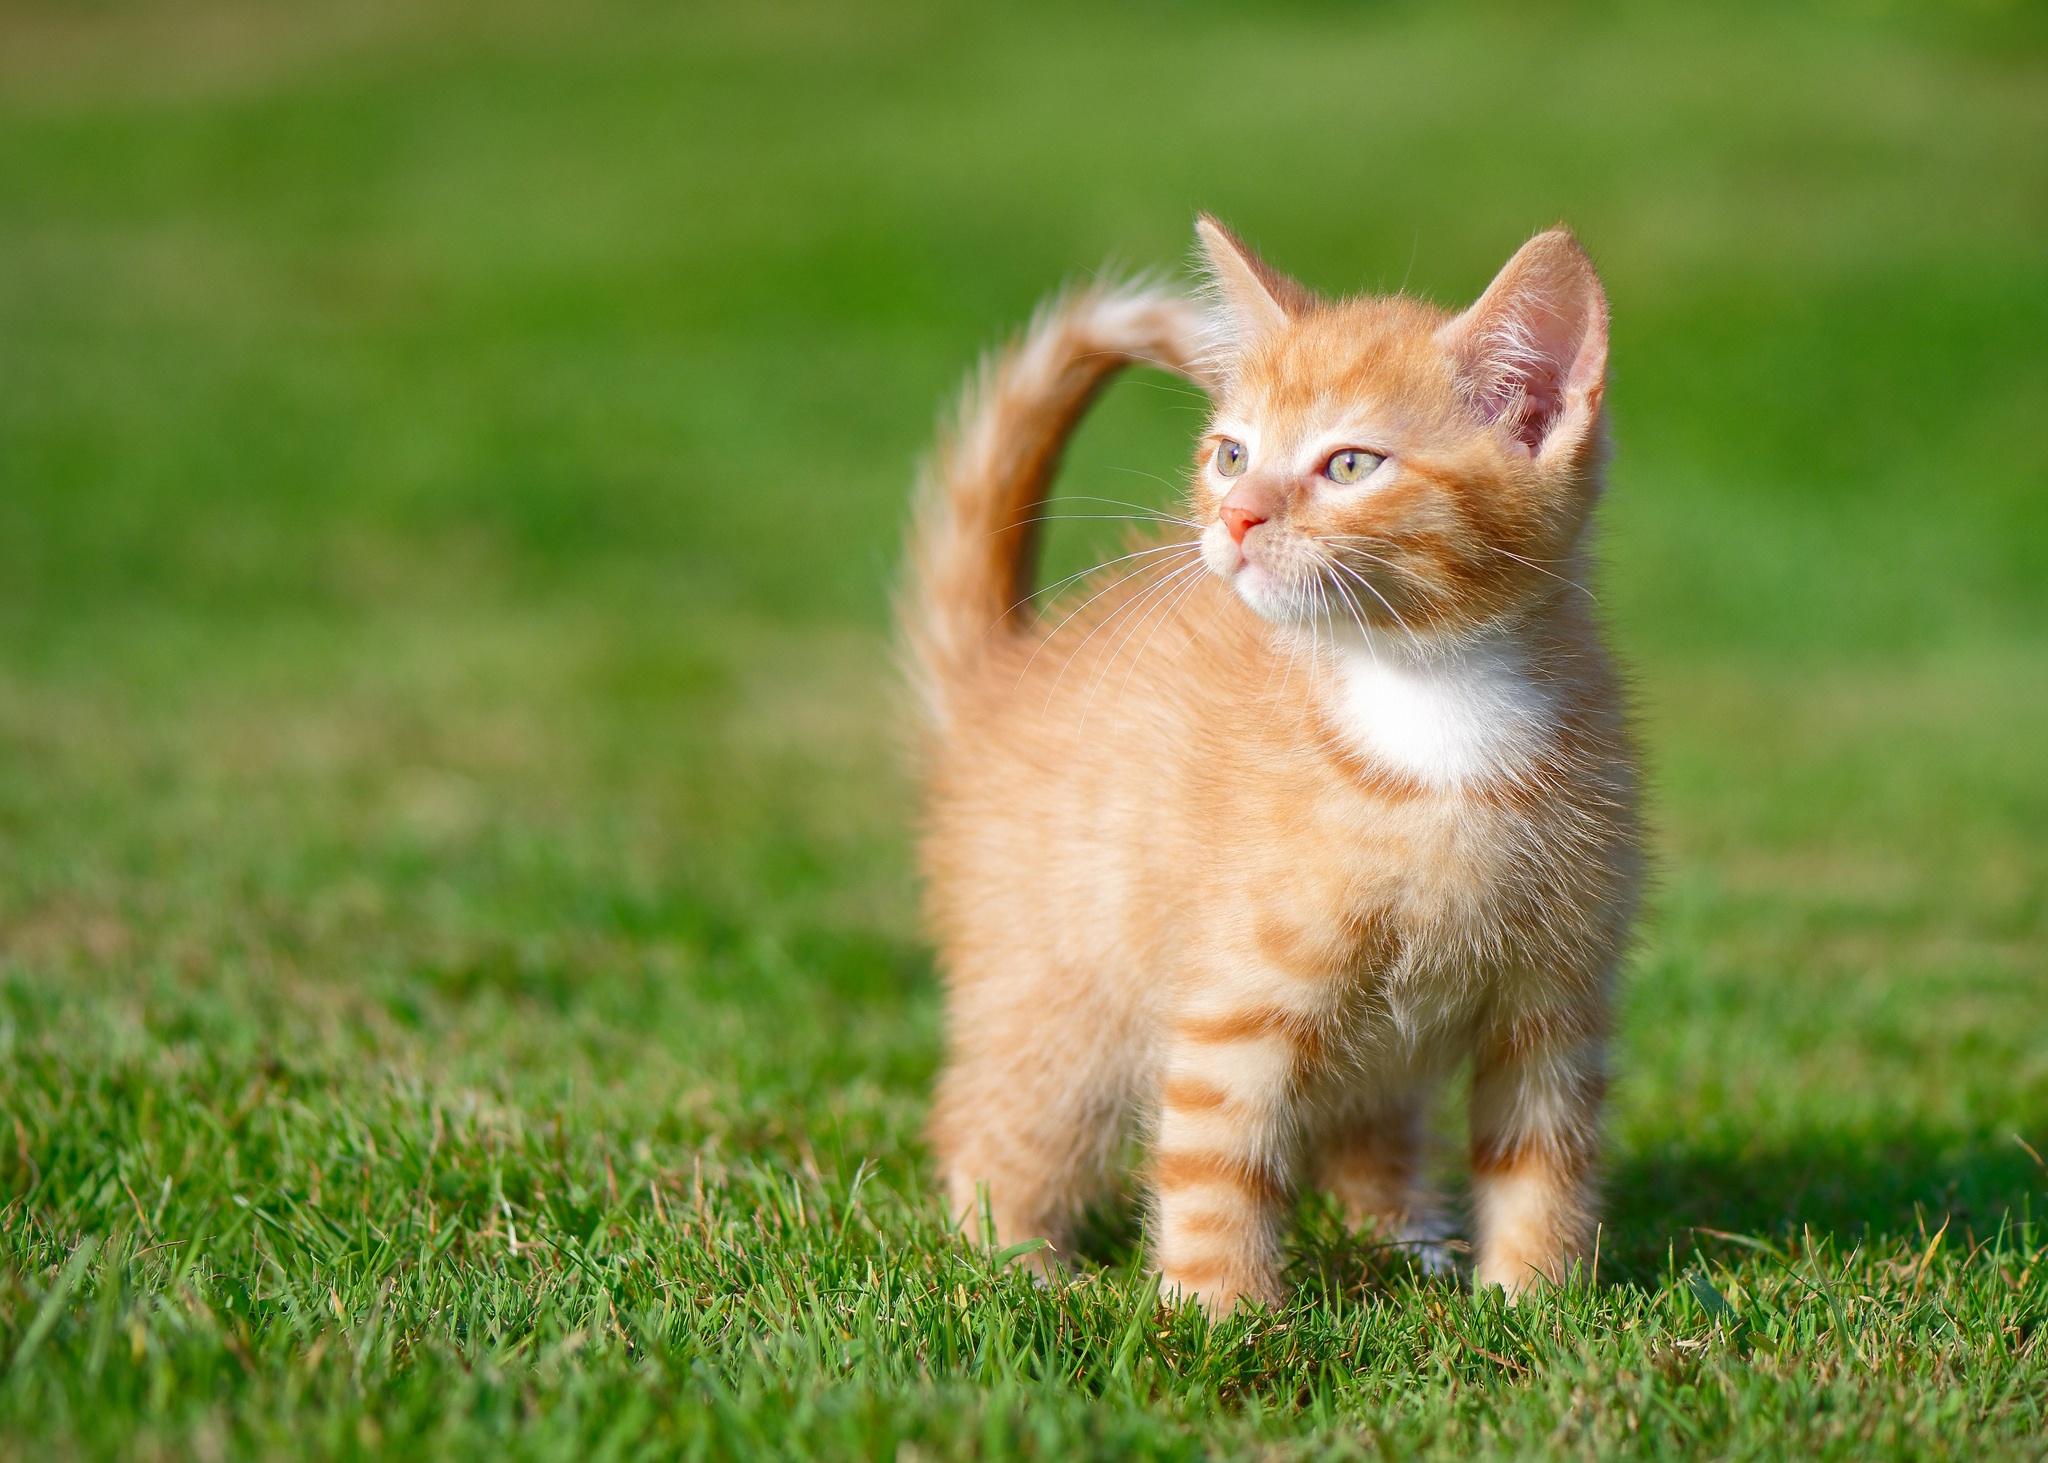 Рыжий котенок картинки фото, днем